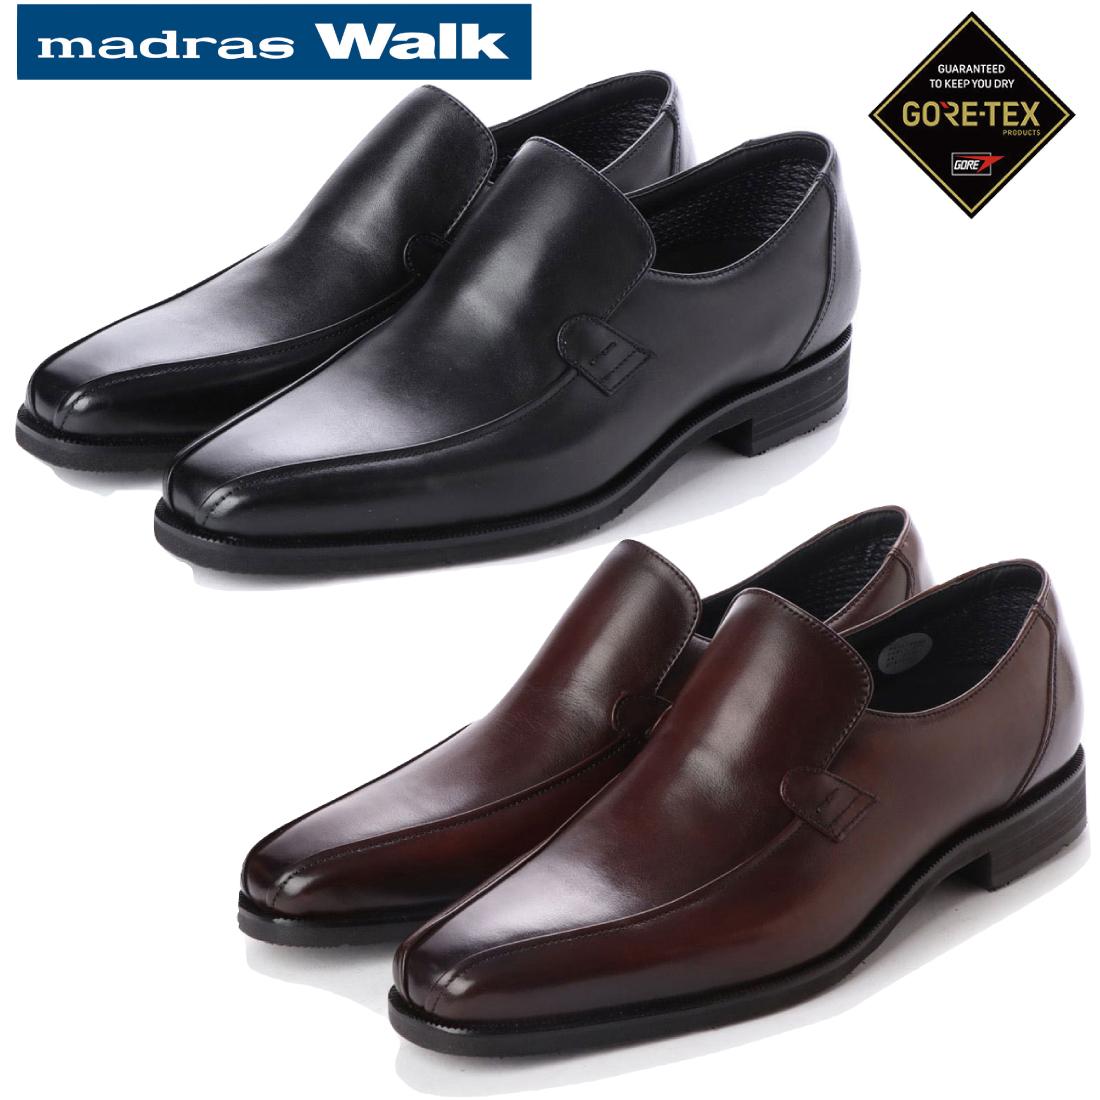 madras Walk マドラス 甲ゴム ヴァンプ ビジネス シューズ ゴアテックス MW5911 【nesh】 【新品】